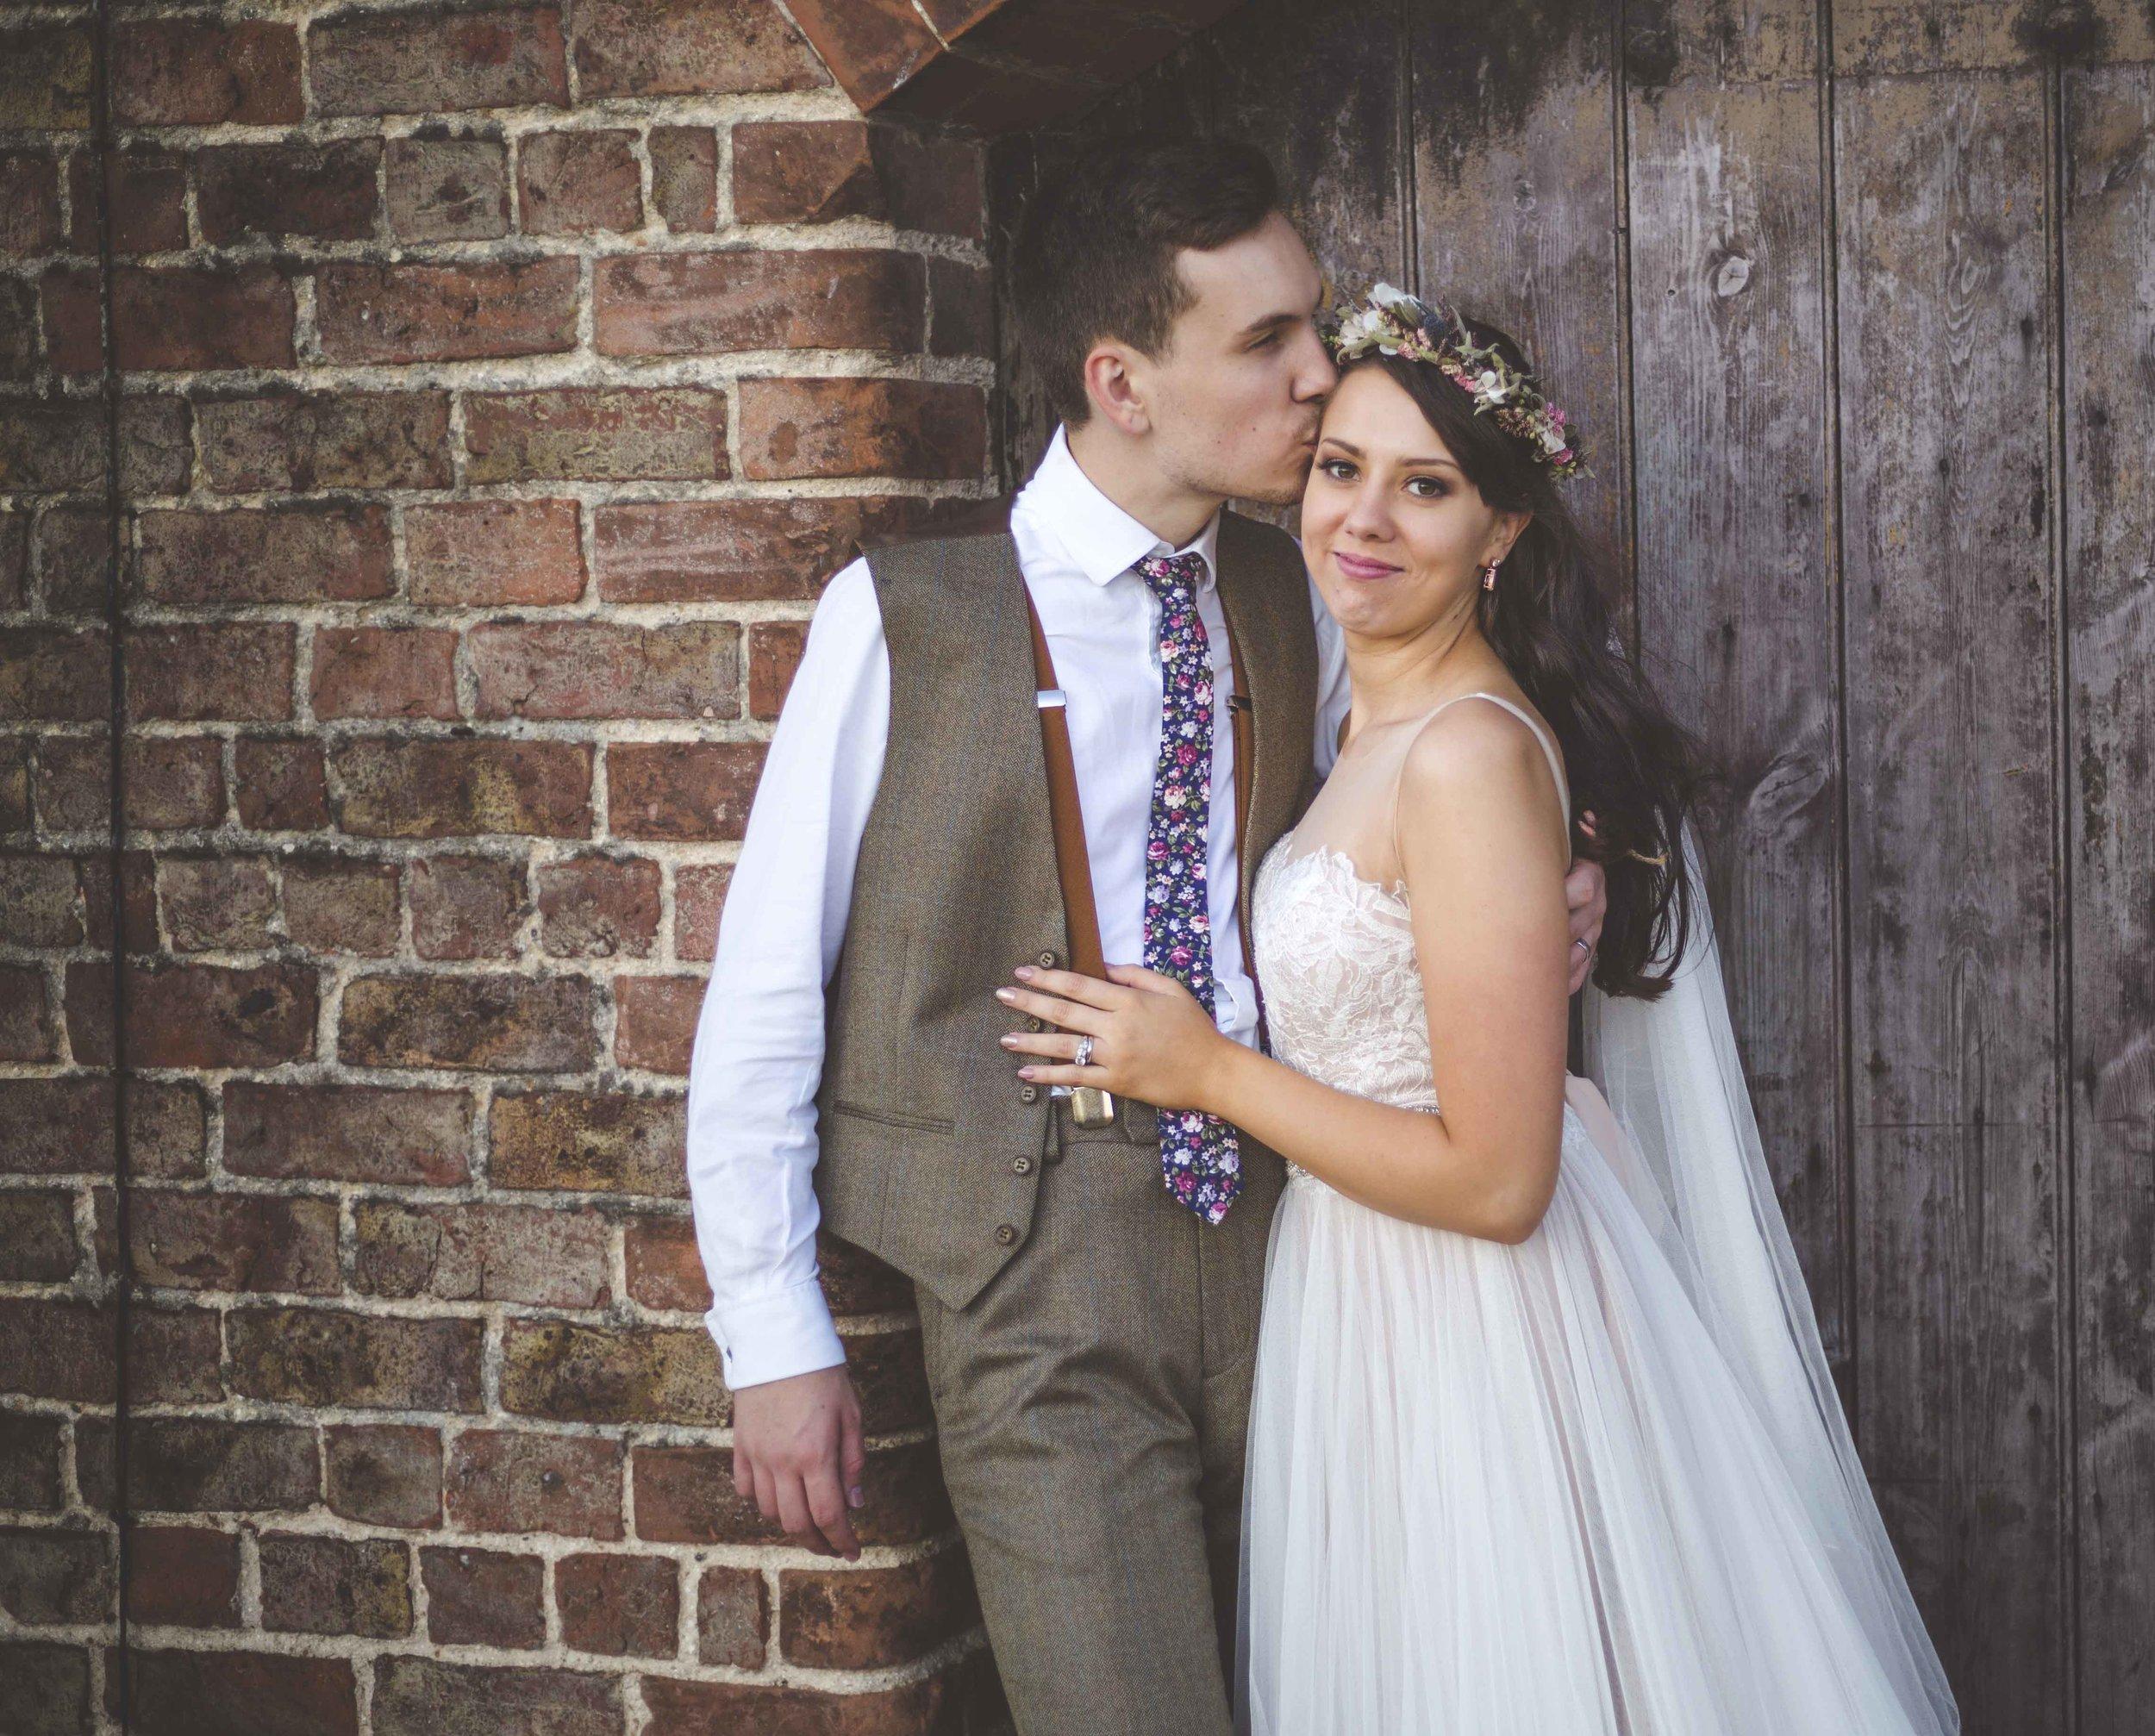 vintage wedding photographer hull.jpg